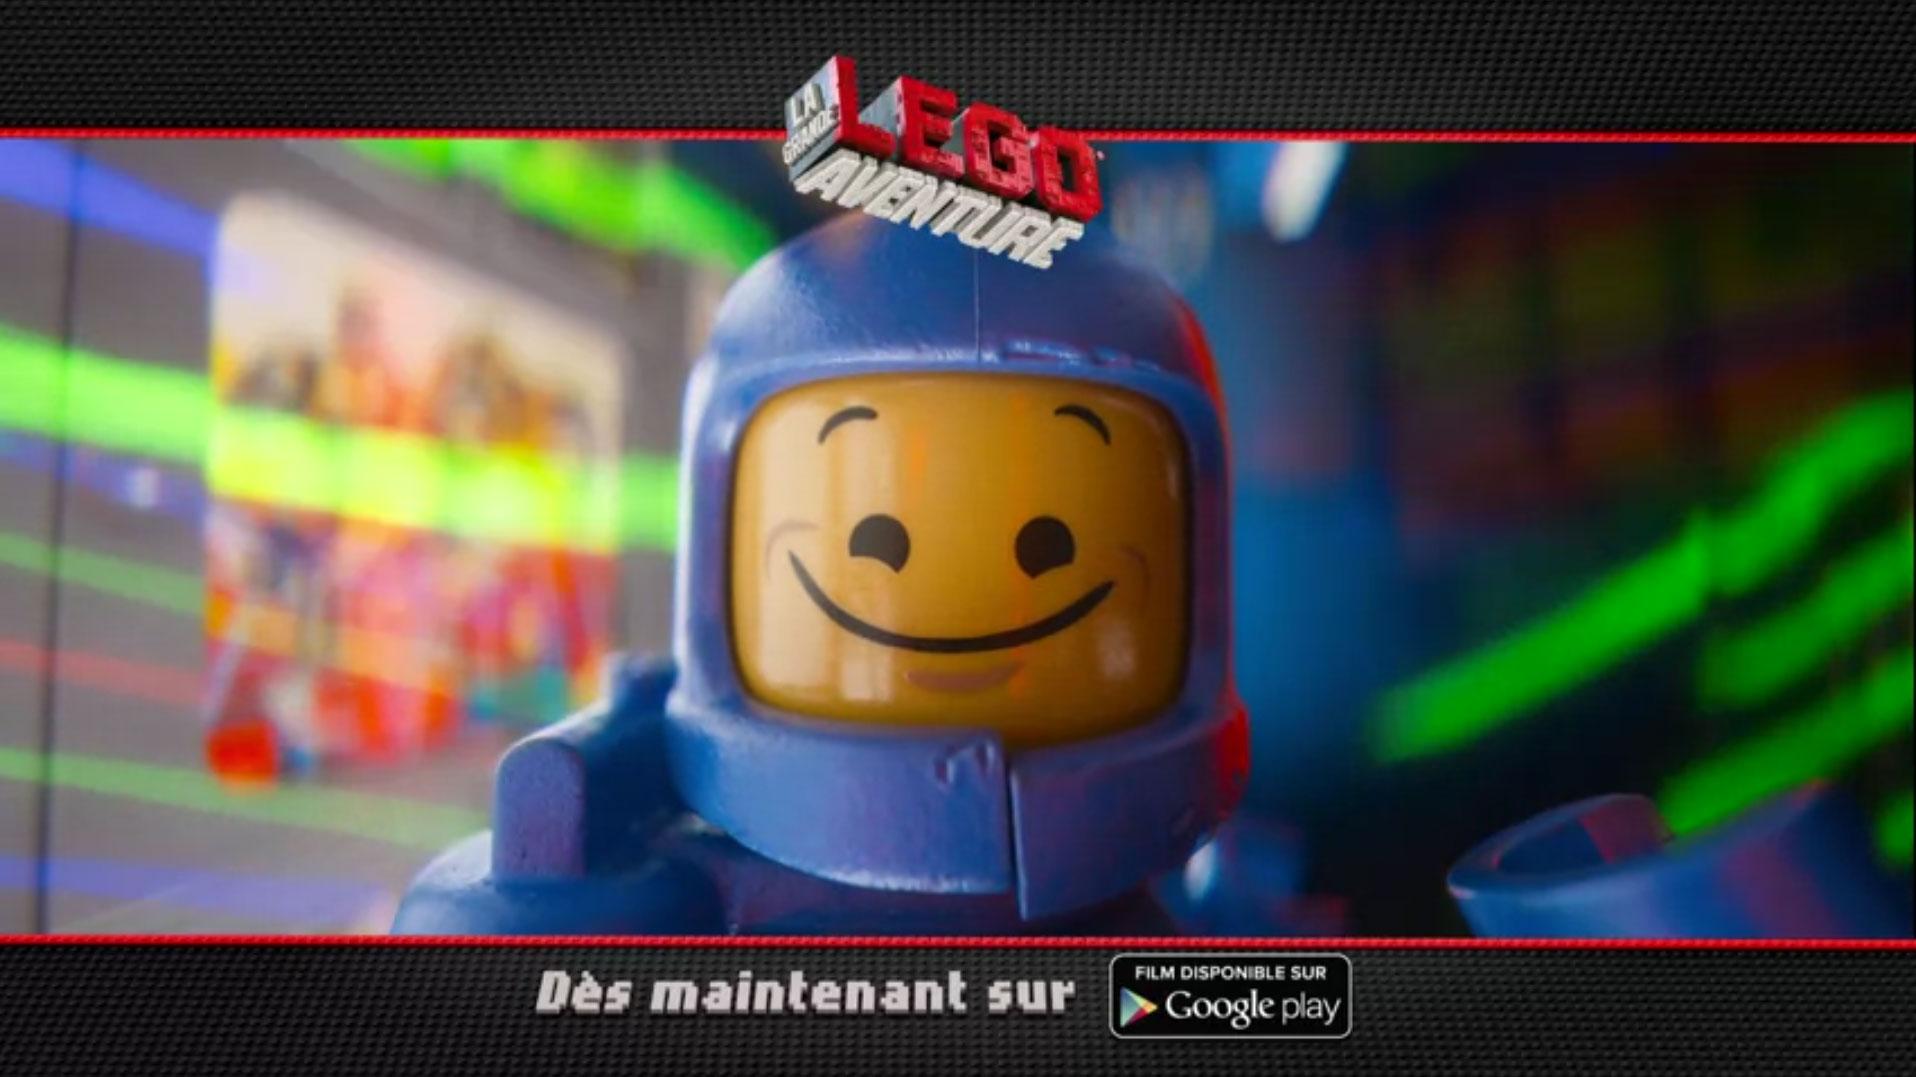 http://ftptwo.twosevenlab.com/site_twoseven/html5_videos/LEGOmovie_DownloadDEF_22s_25juin.jpg